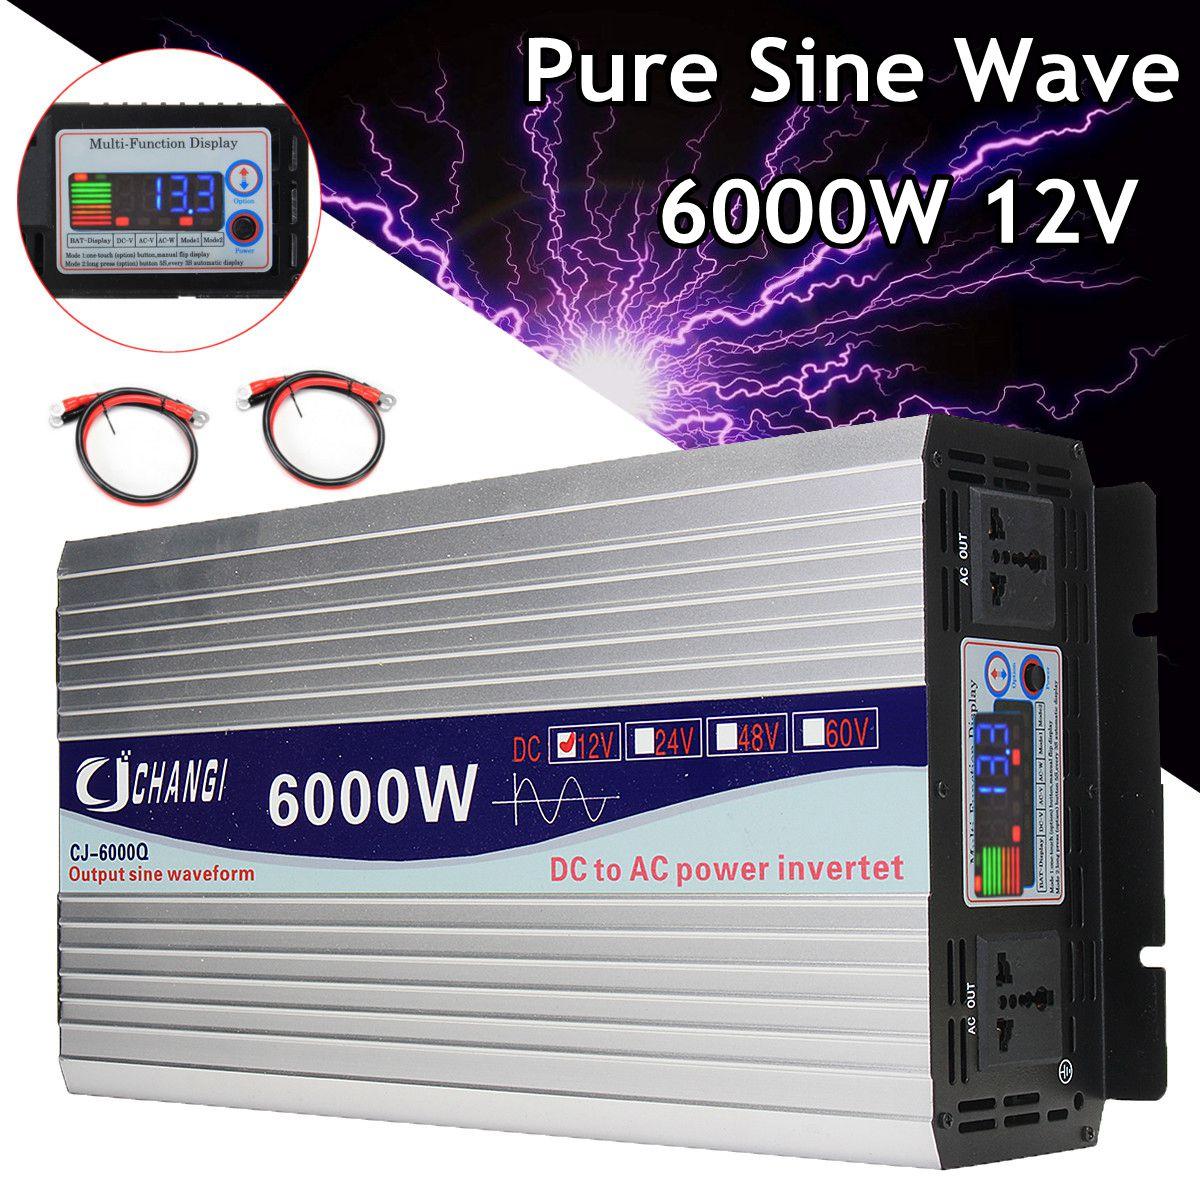 Écran Intelligent pur onduleur à onde sinusoïdale 12 V/24 V à 220 V 3000 W/4000 W/5000 W/6000 W convertisseur adaptateur écran LCD